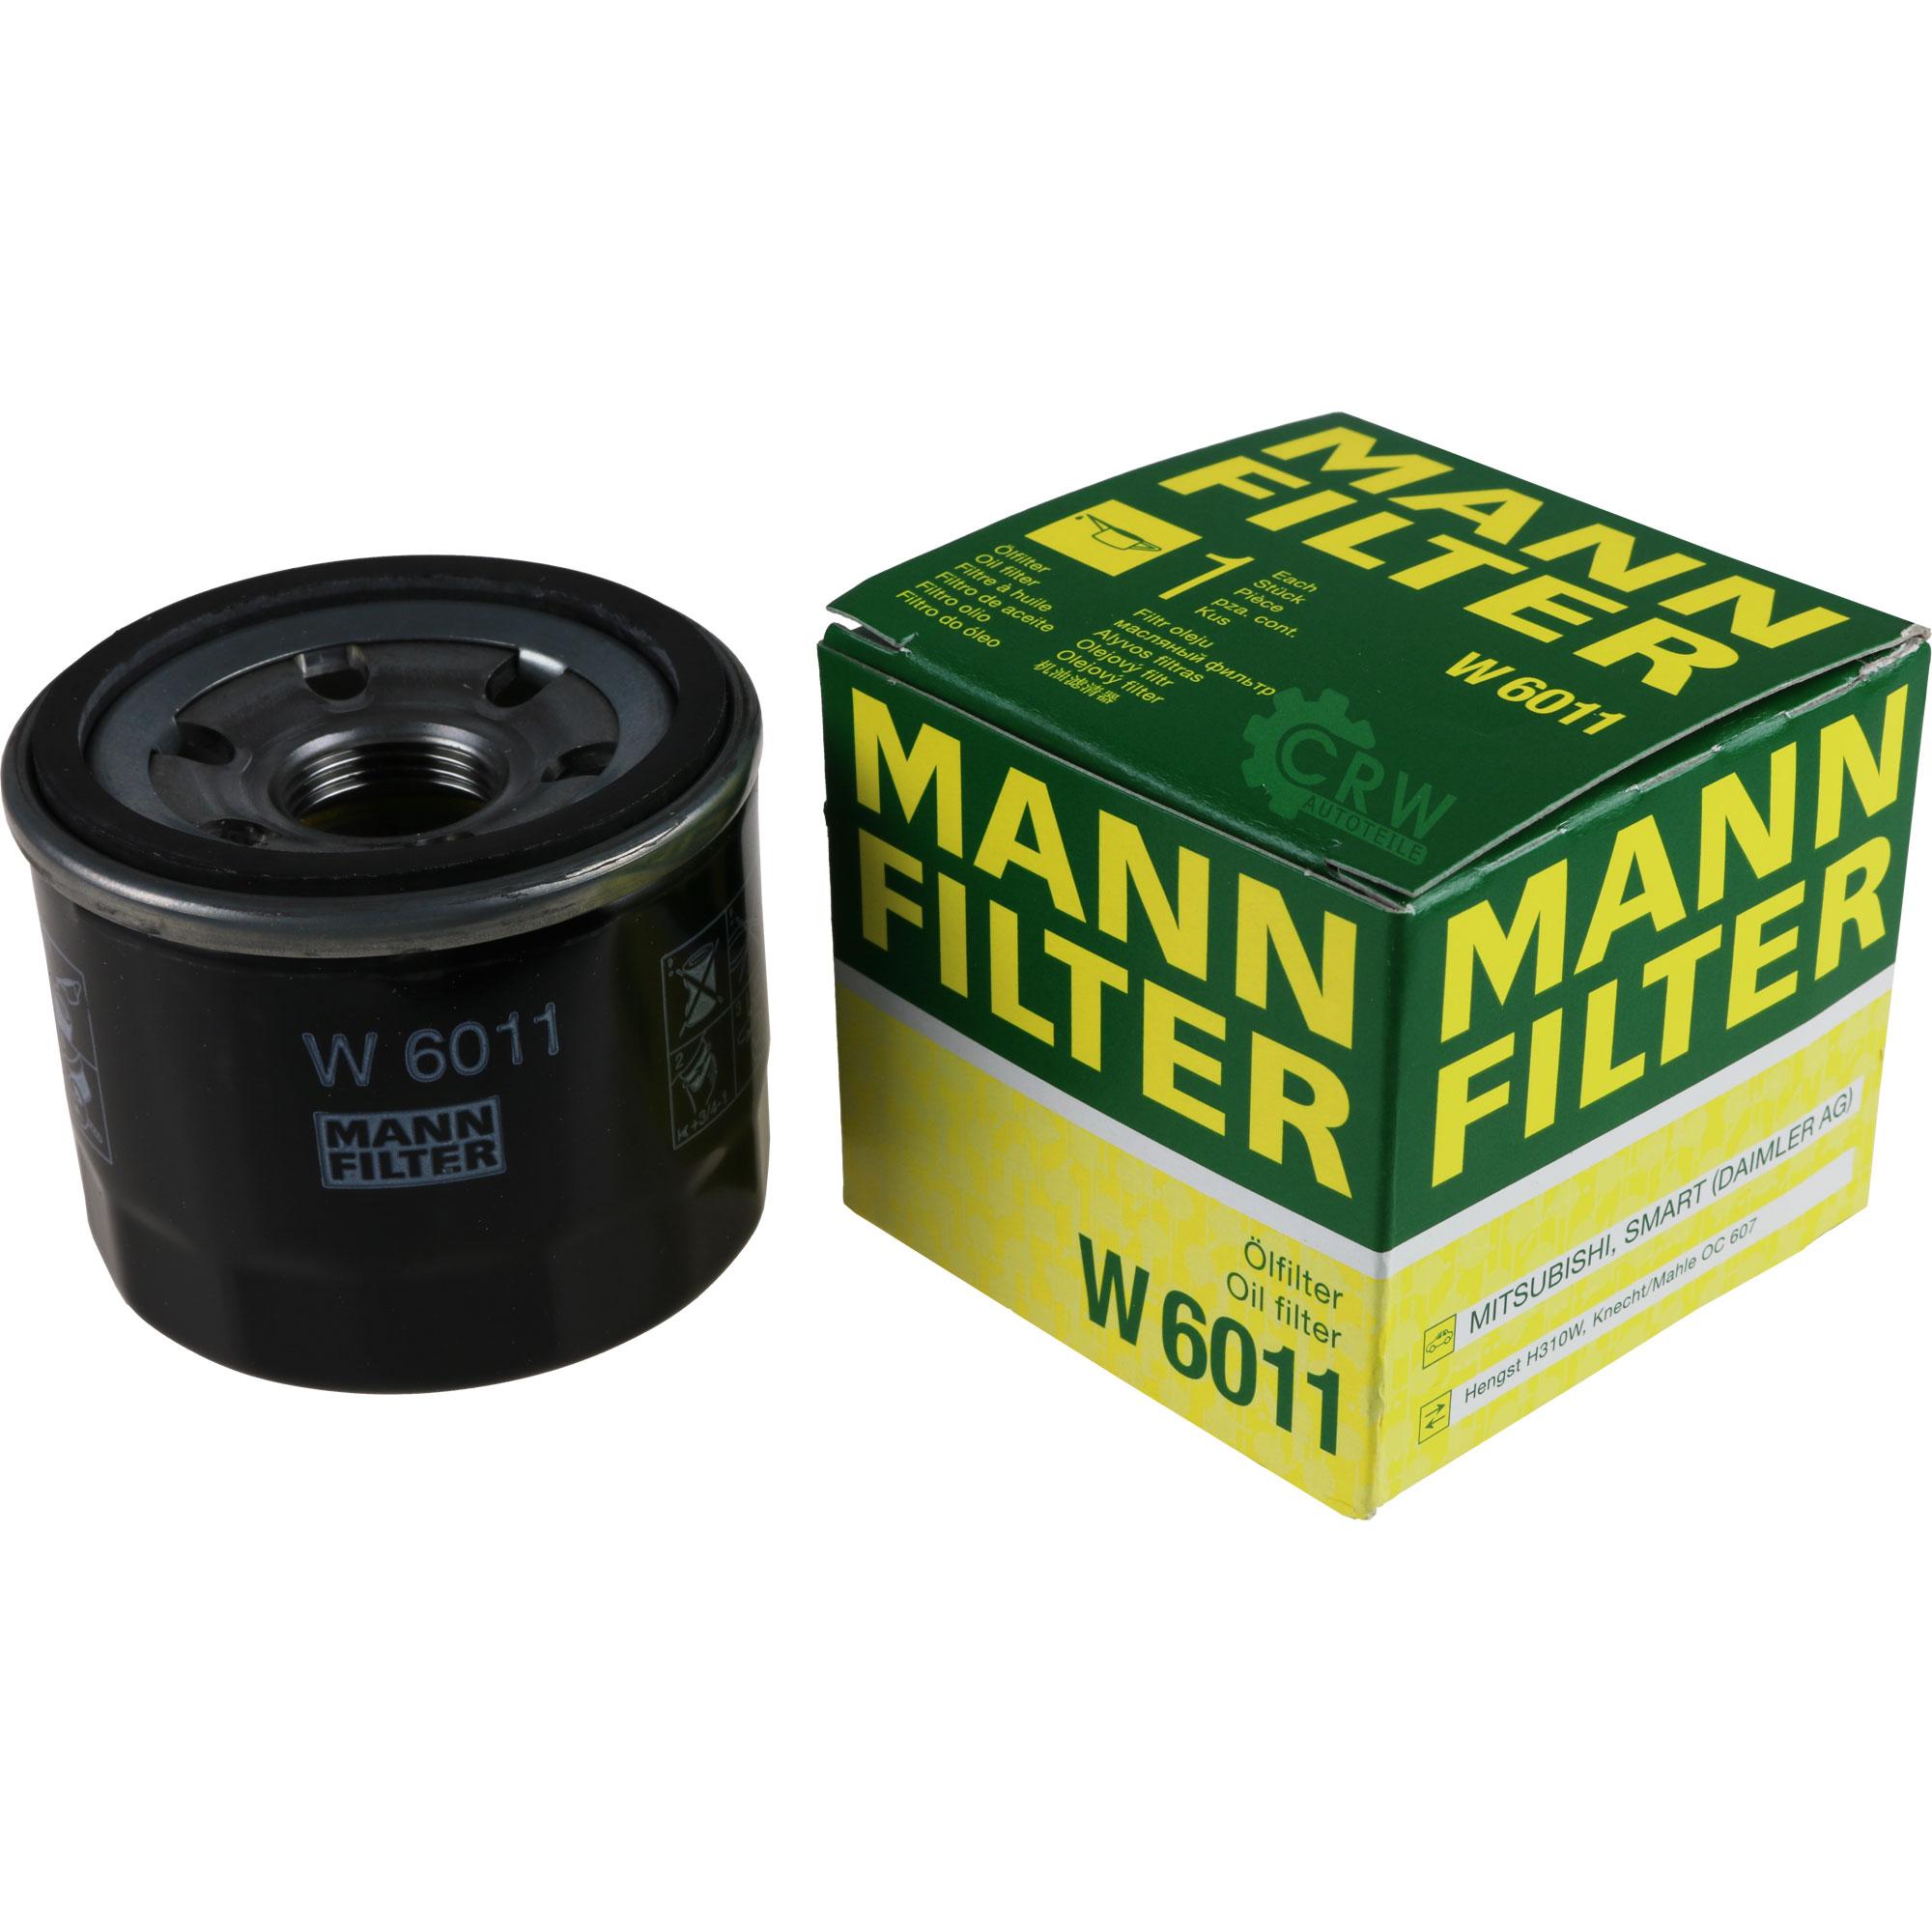 5L-Inspektionspaket-Mercedes-229-51-Motoroel-5W-30-MANN-Olfilter-11124948 Indexbild 3